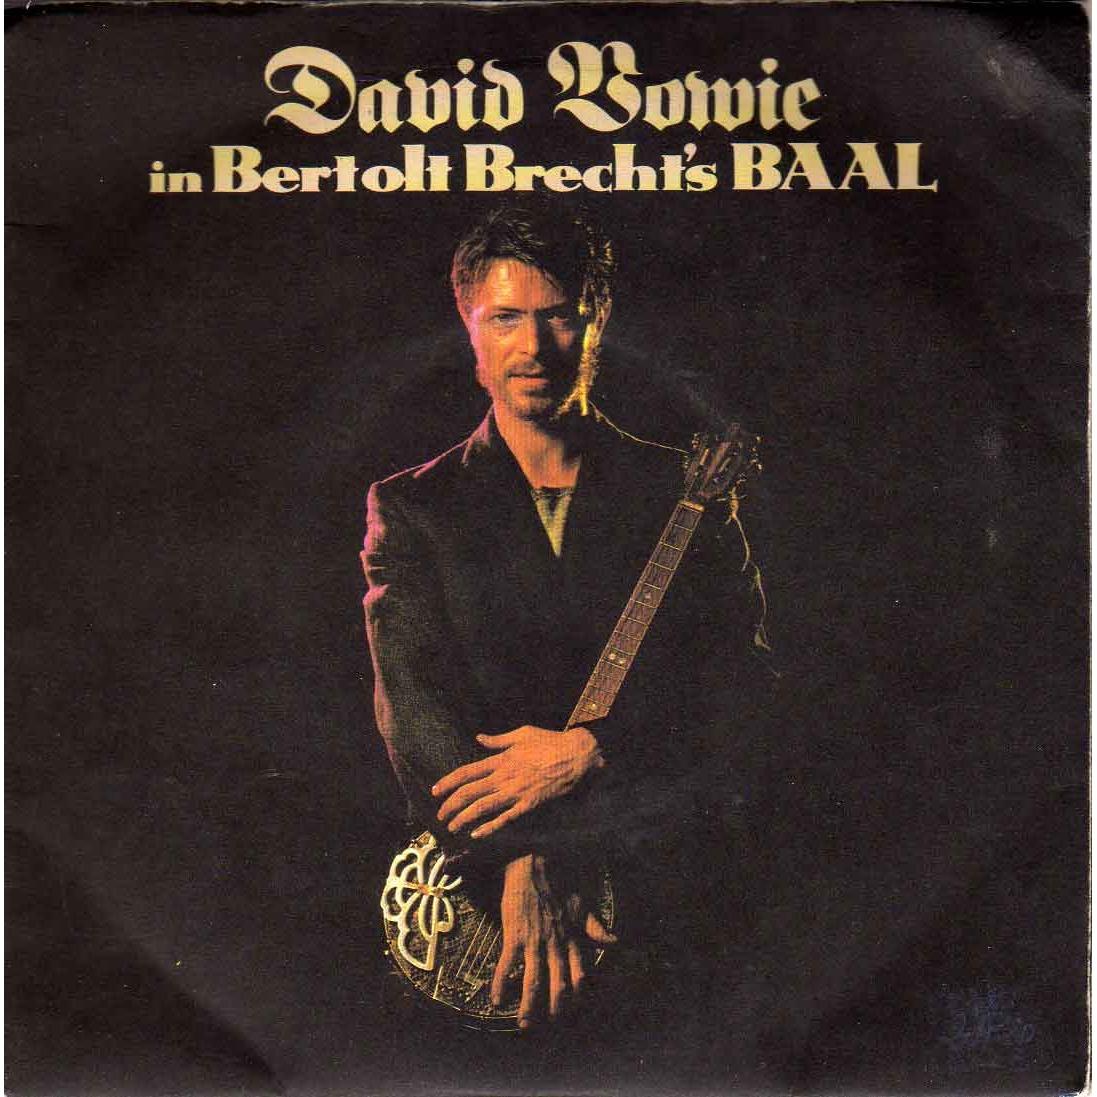 Clássicos e Achados: David Bowie – in Bertolt Brecht's Ball [1982]